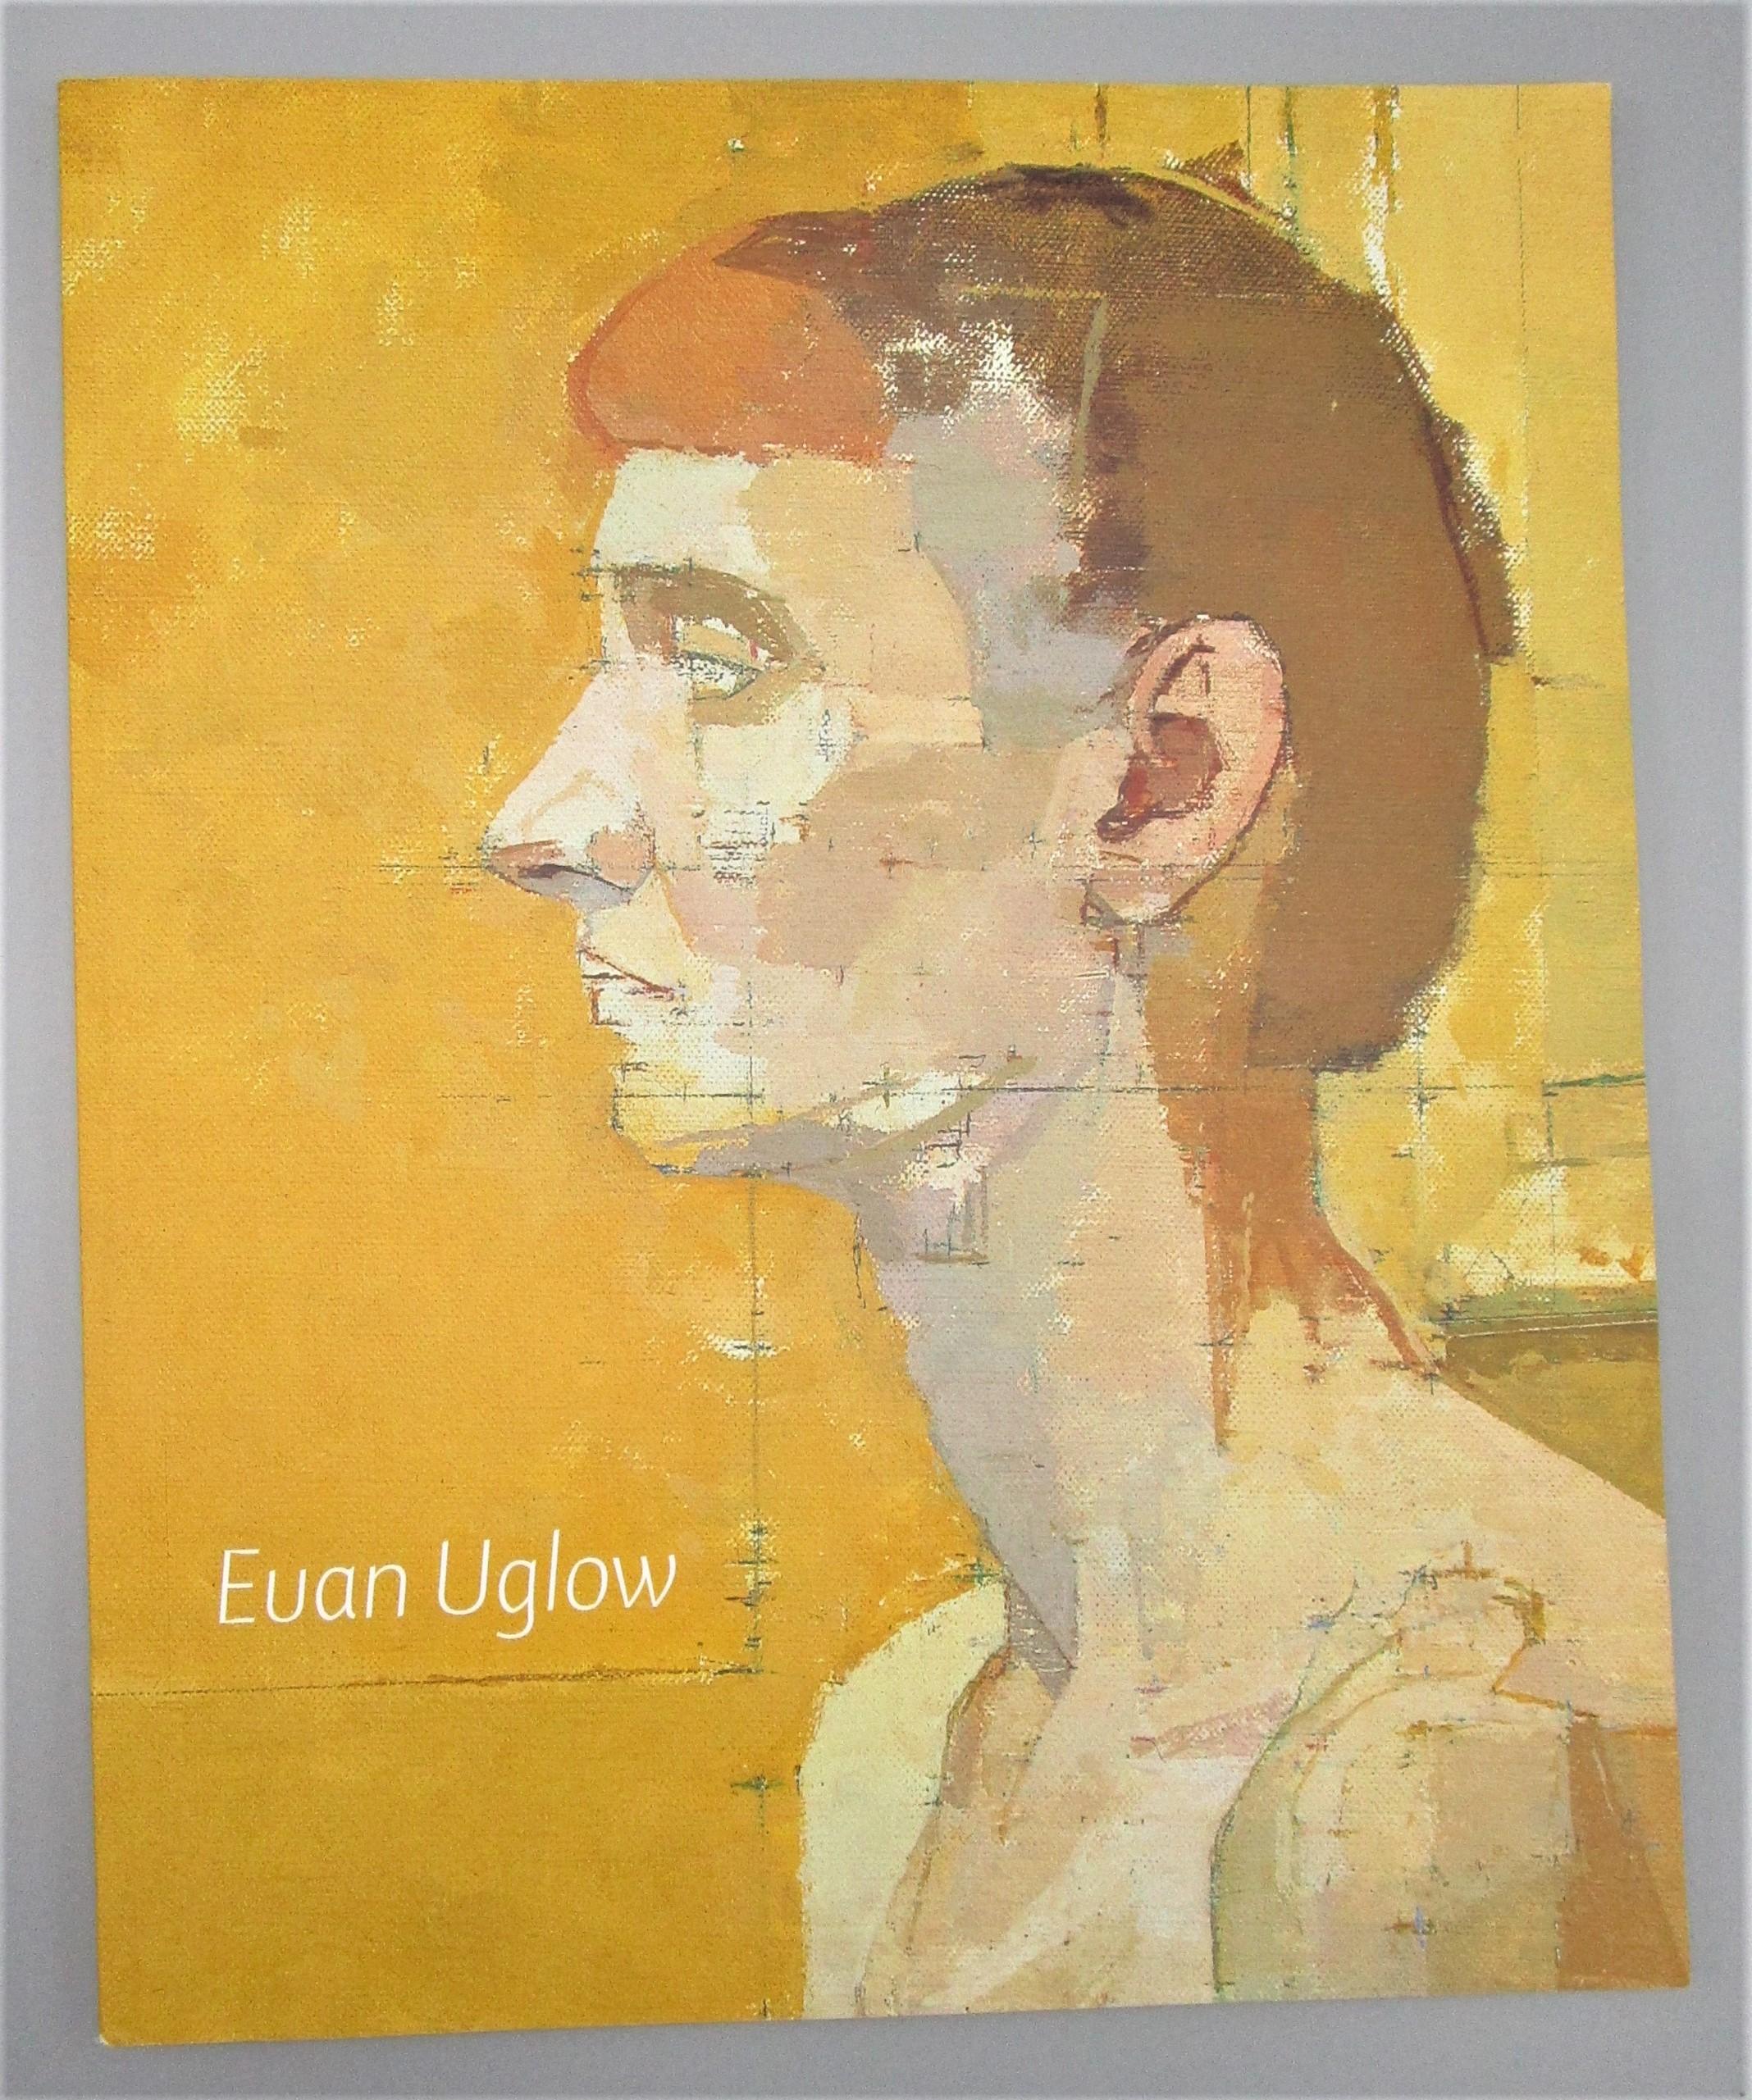 EUAN UGLOW: PAINTINGS AND DRAWINGS - 2007